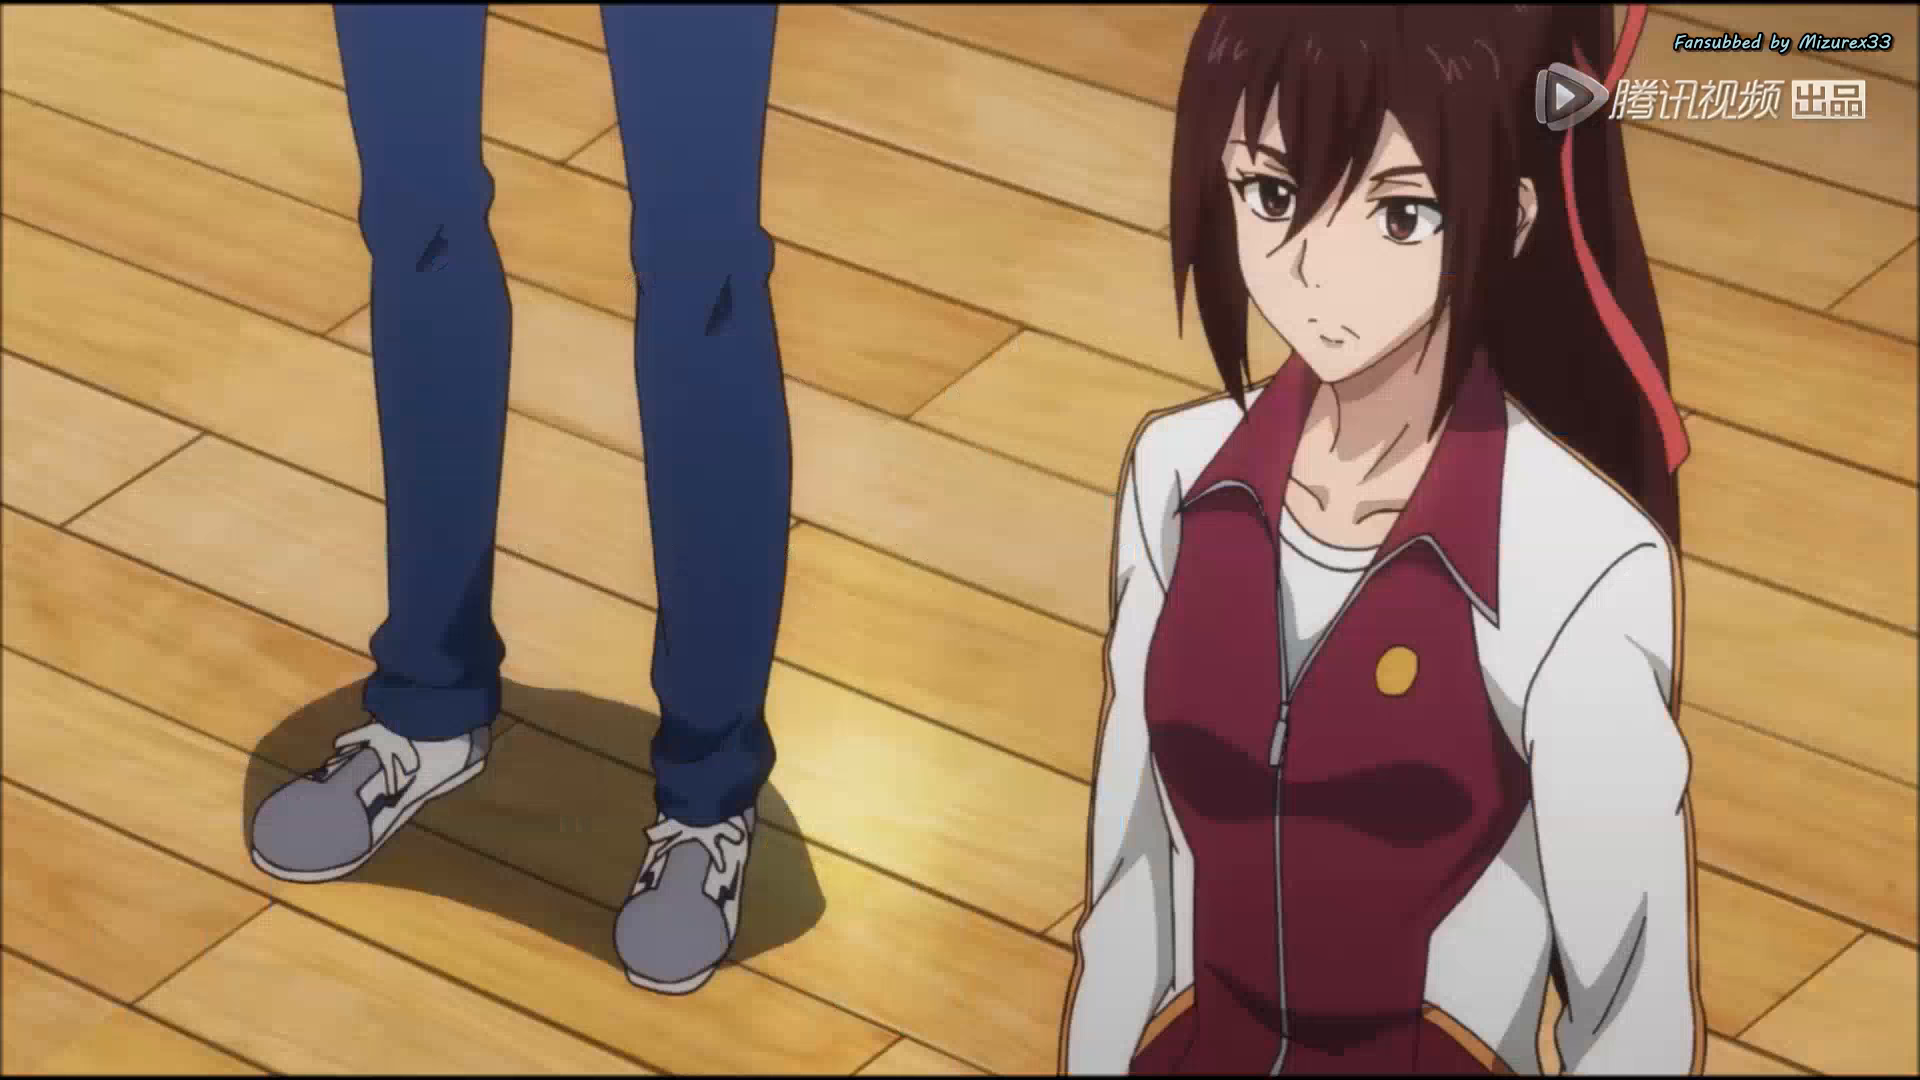 Mizurex33] Quanzhi Fashi Season 2 Episode 4 [1080p] mkv | Anime Tosho